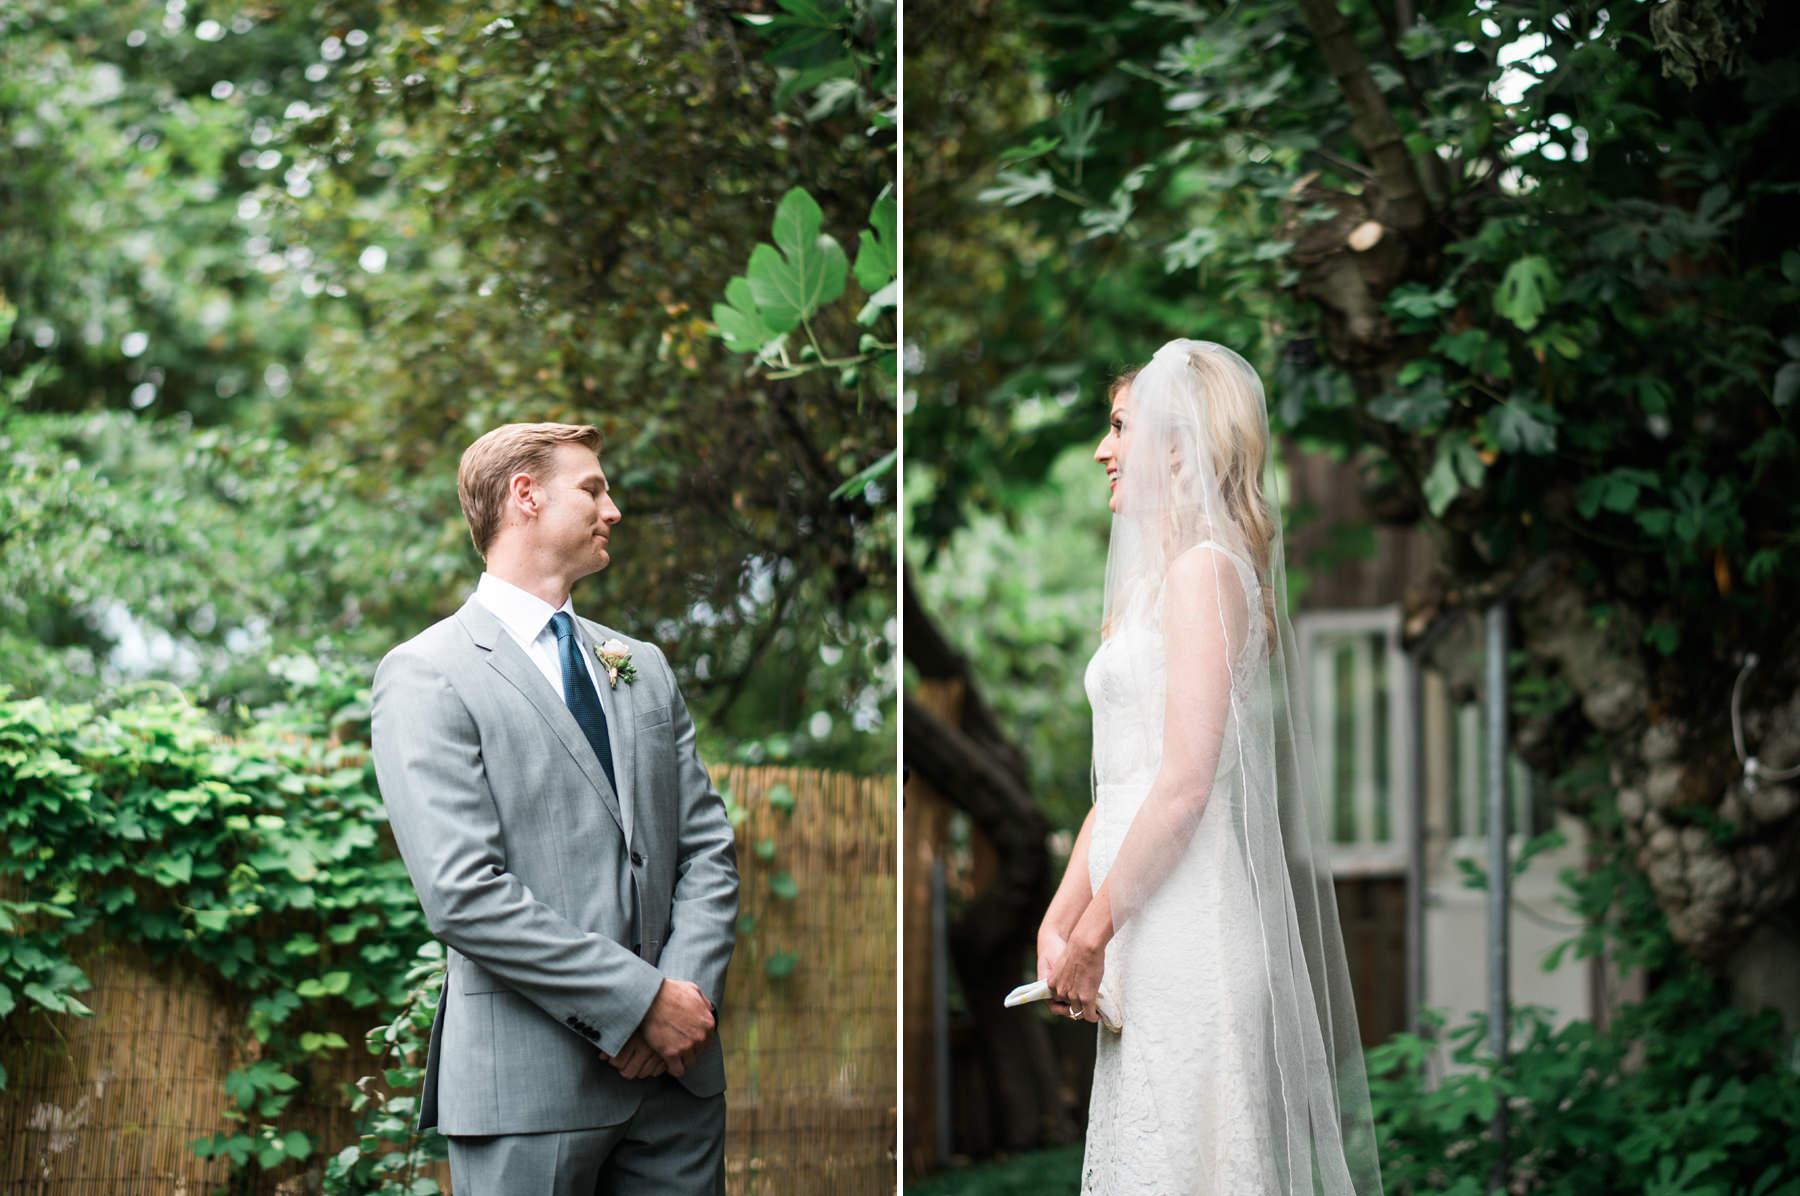 206-outdoor-wedding-ceremony-at-the-corson-building.jpg